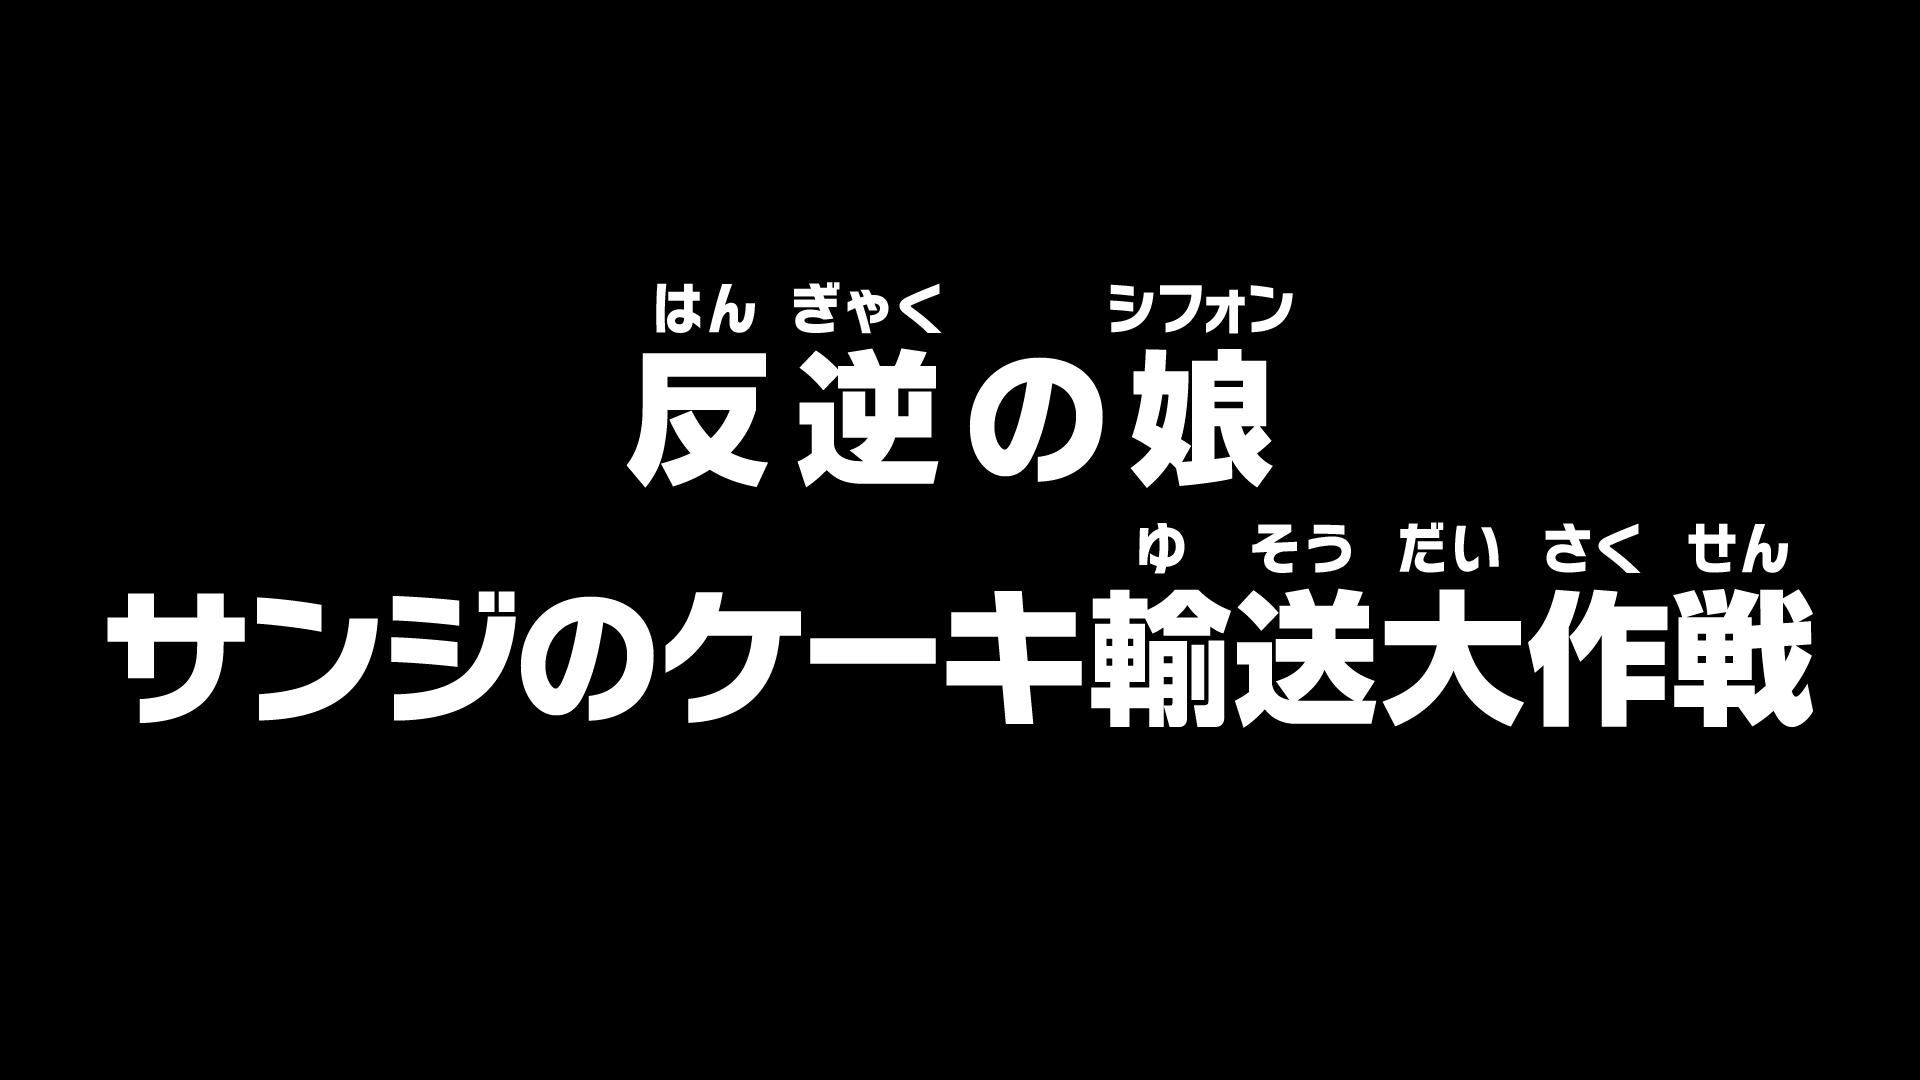 Episode 859